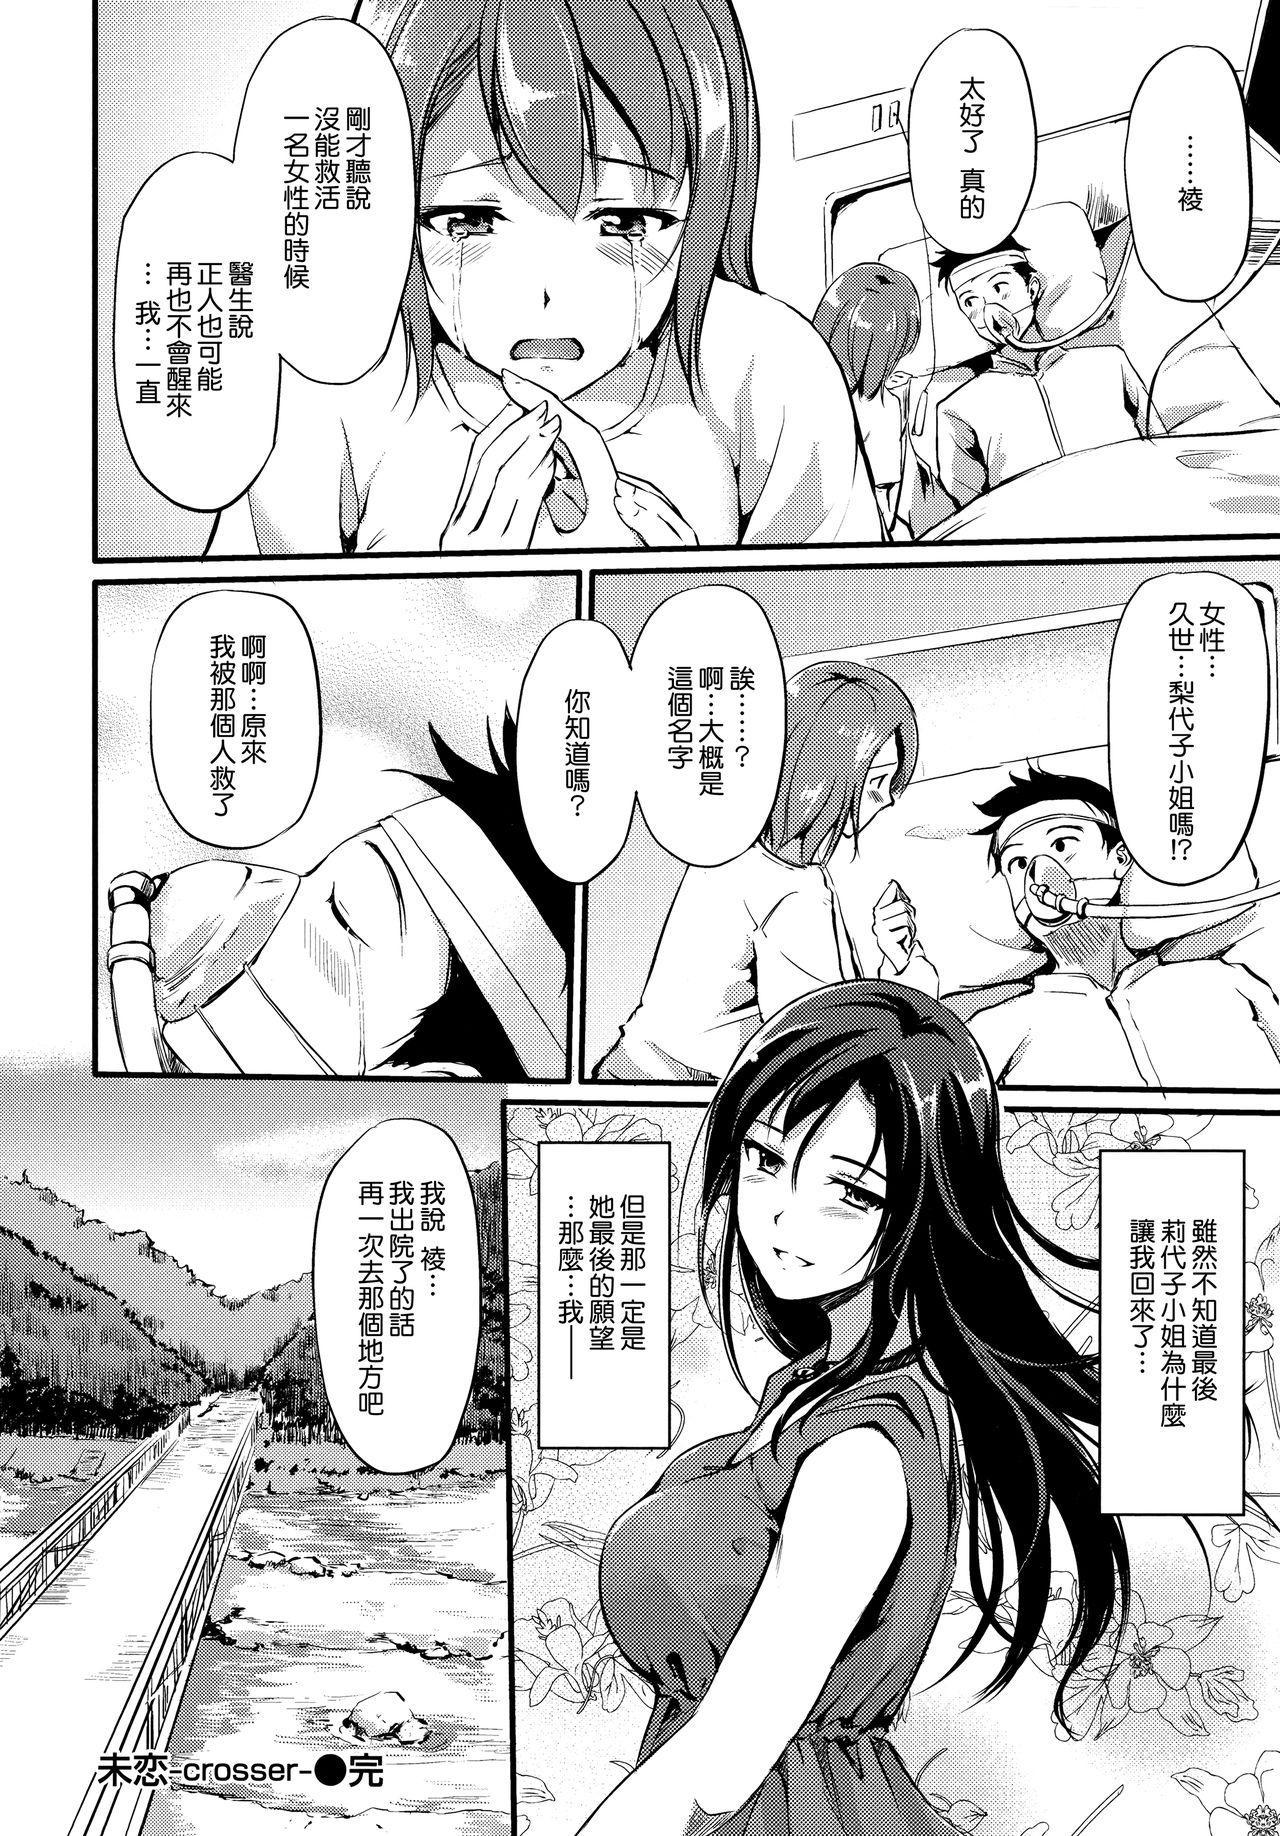 Kimagure Hanabira + Toranoana Leaflet 174